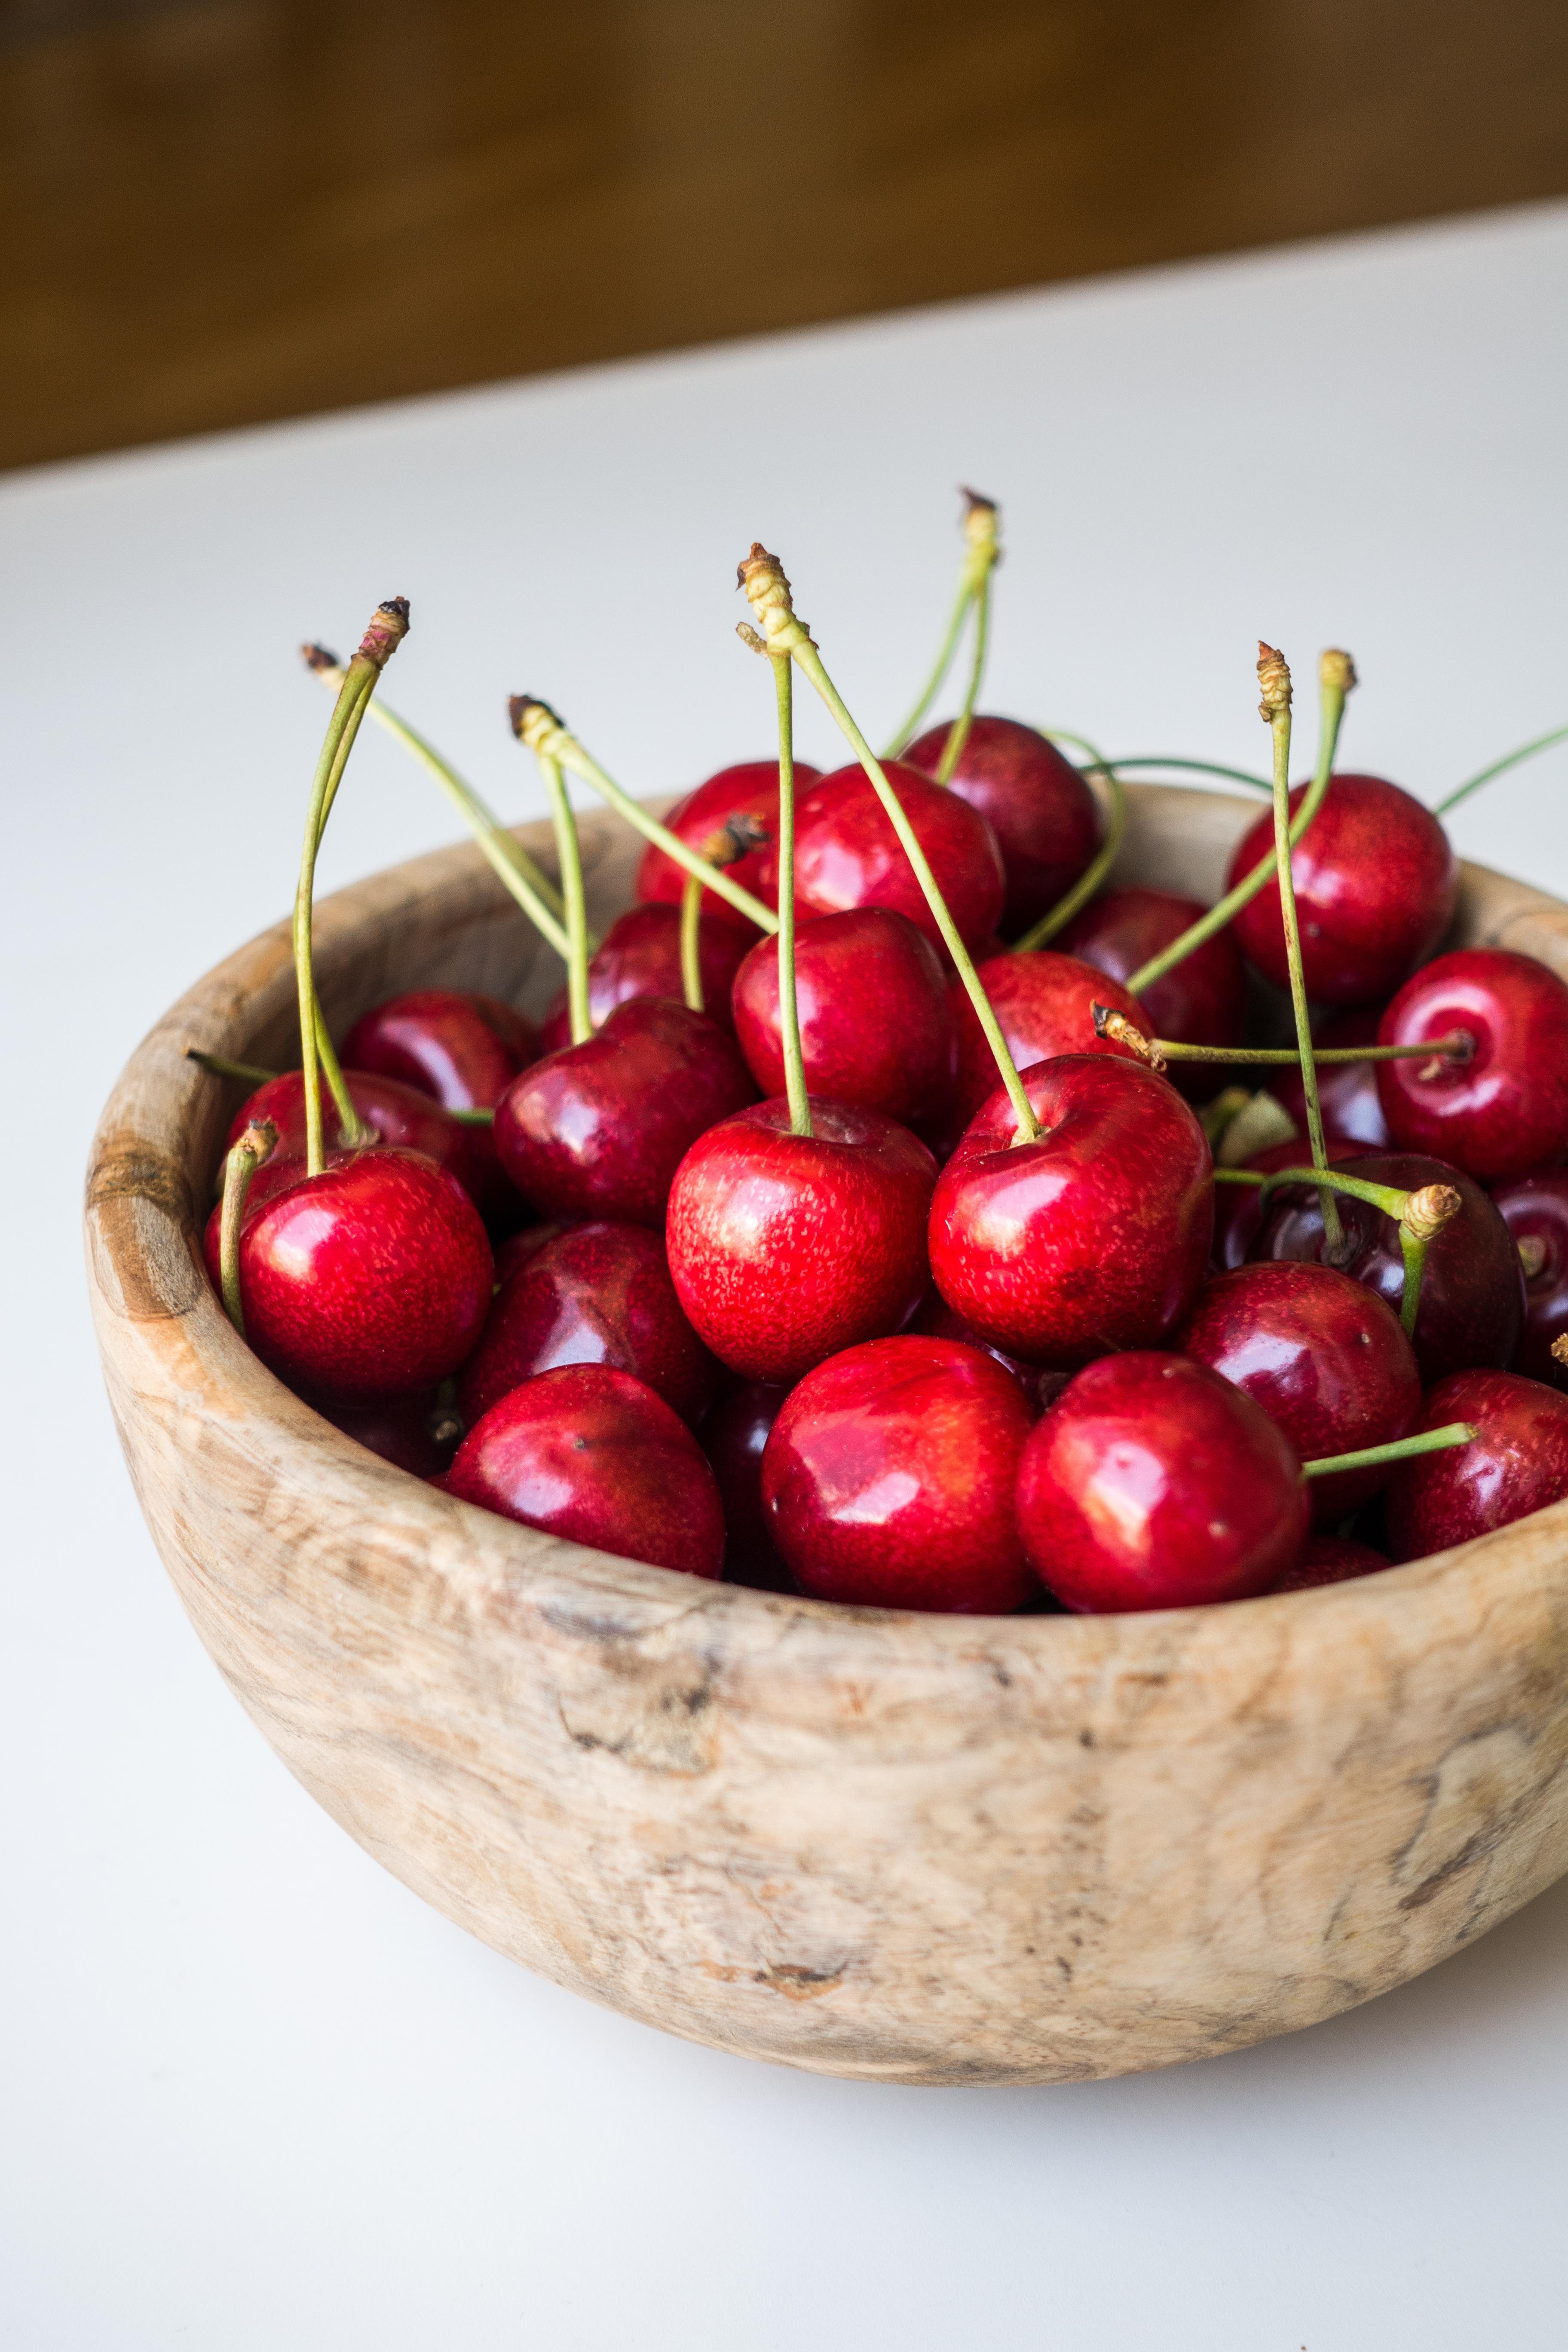 Fresh cherries in a wooden bowl